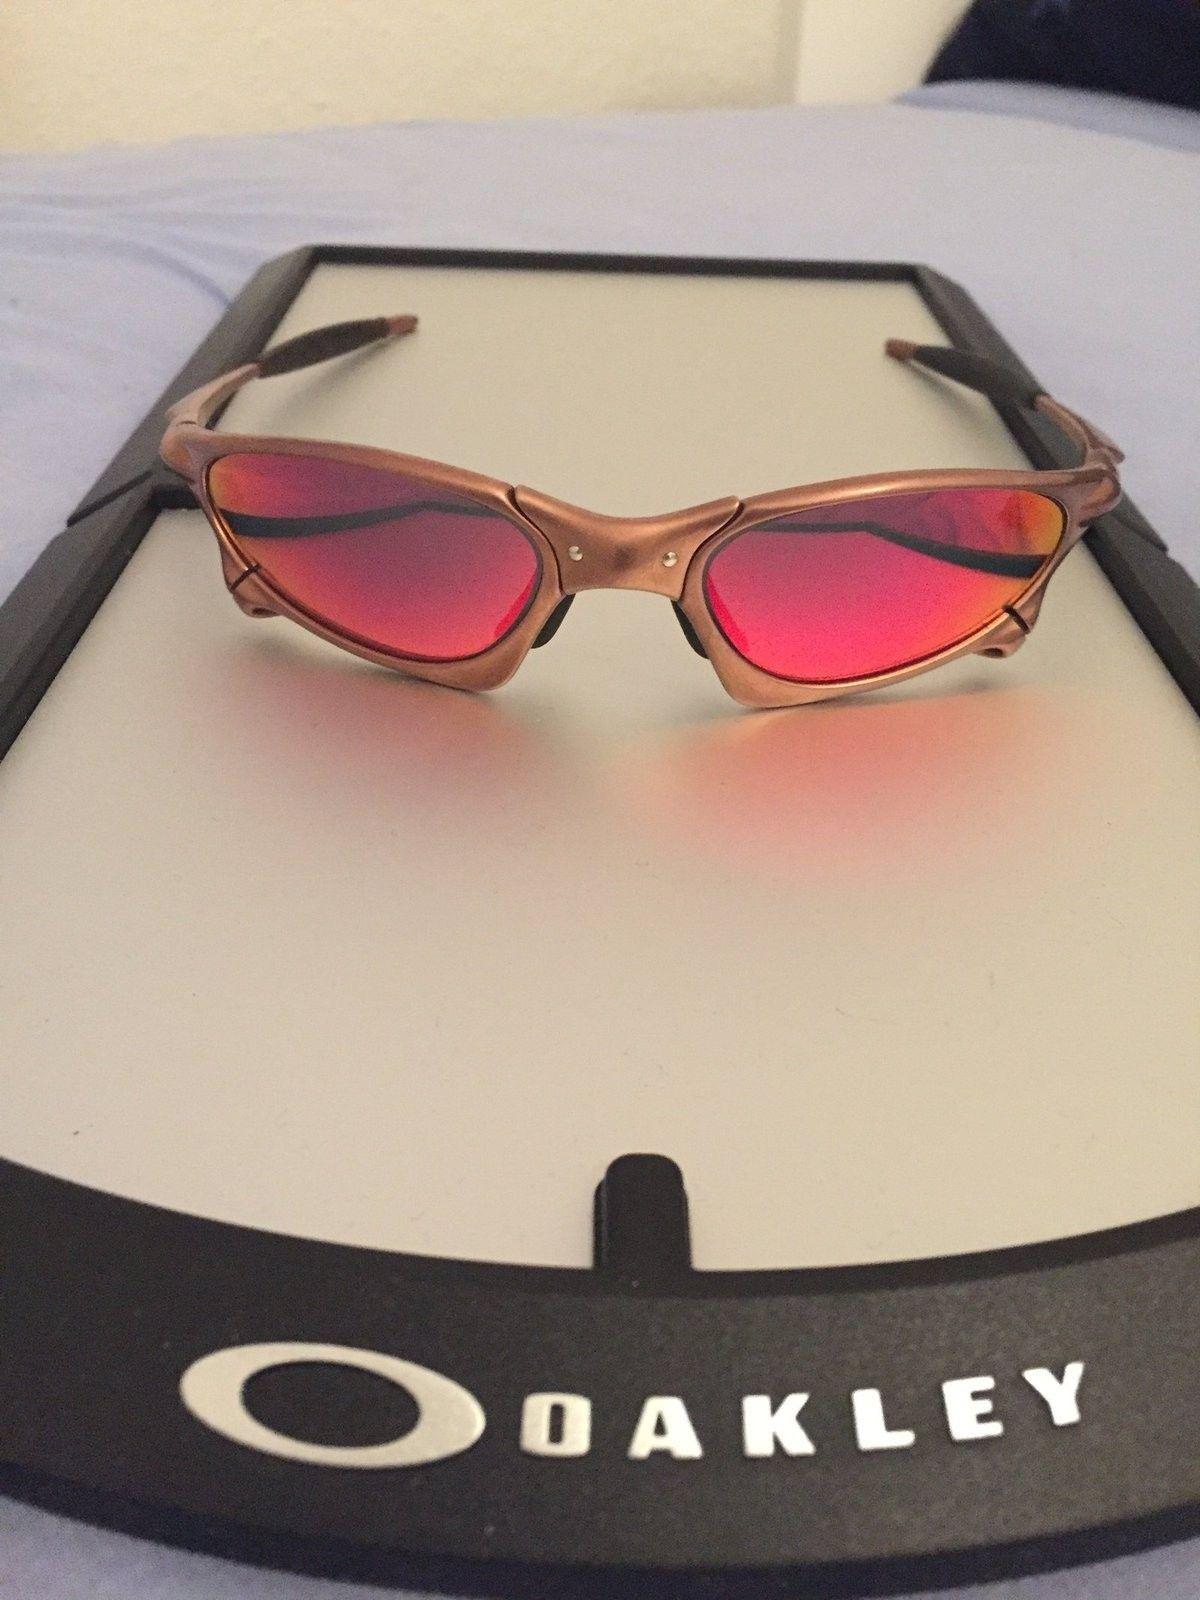 Penny Copper with Ruby Quartz lenses - image.jpeg